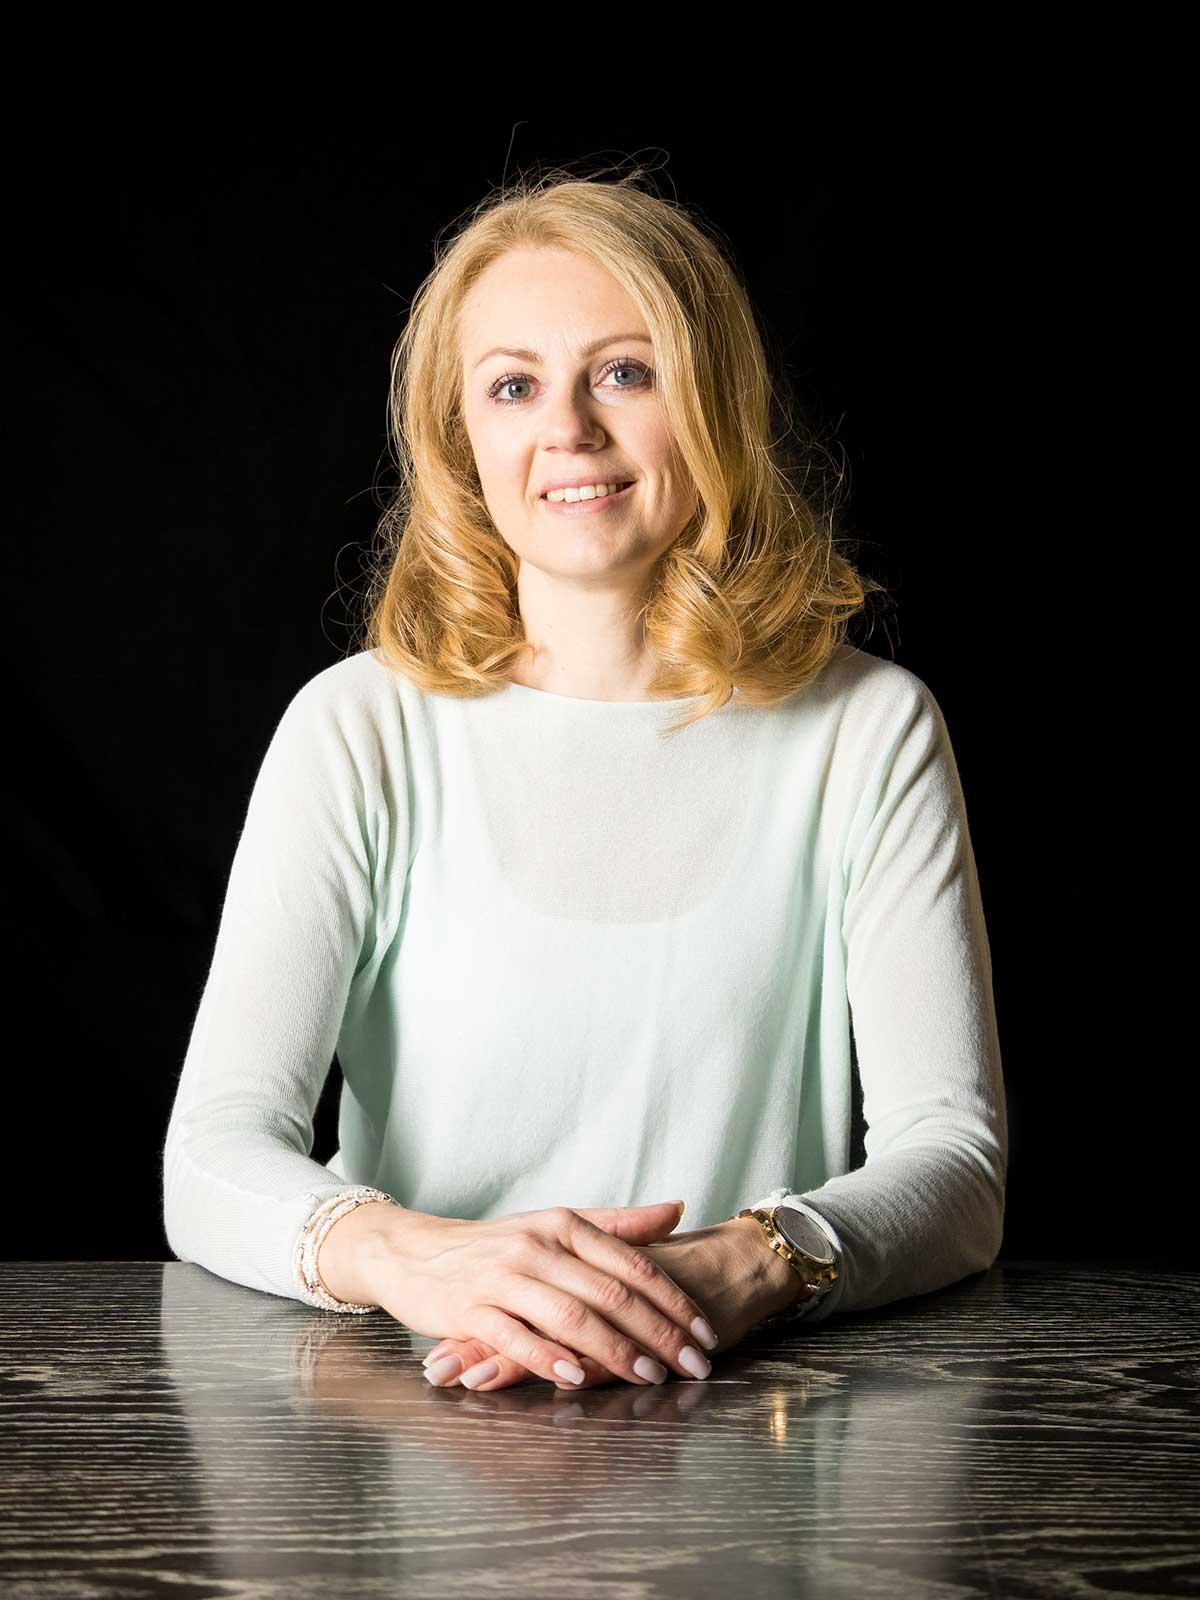 Karin Wartberger, verkauf innendienst, kundenberaterin, avd goldach ag